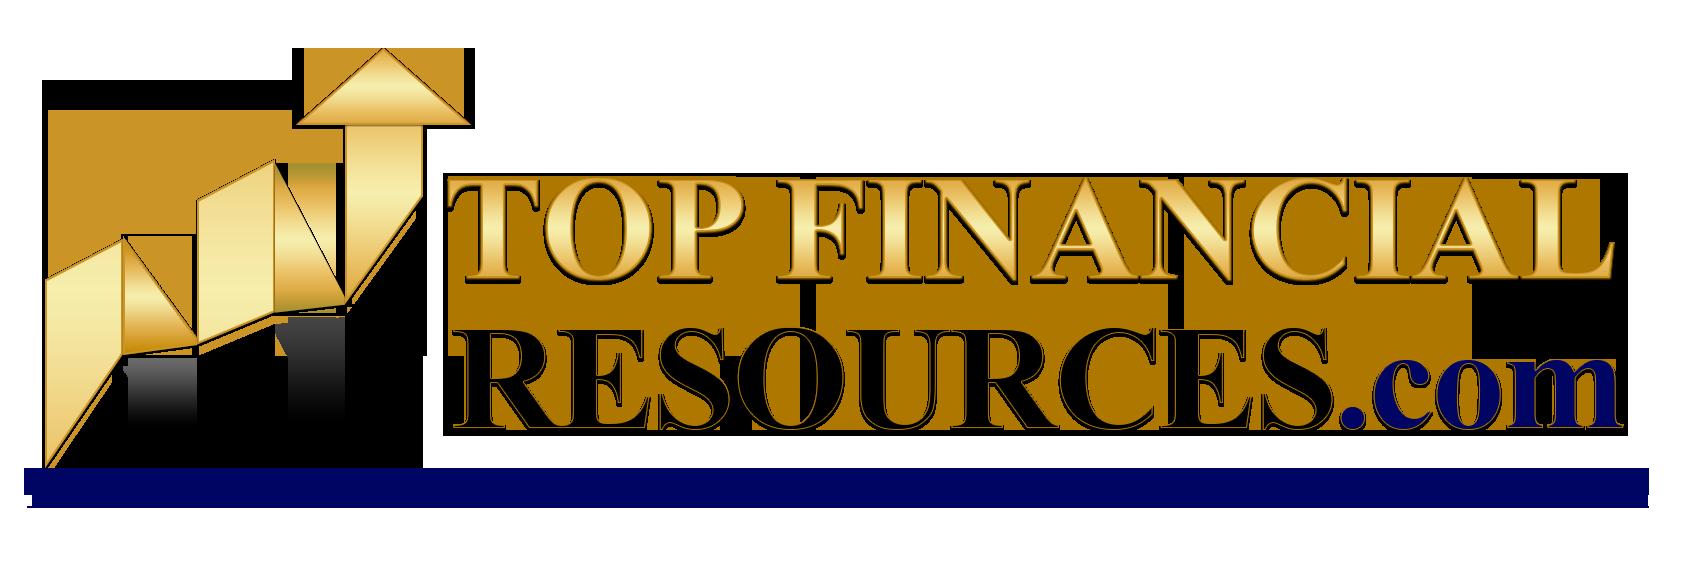 Top Financial Resources Logo